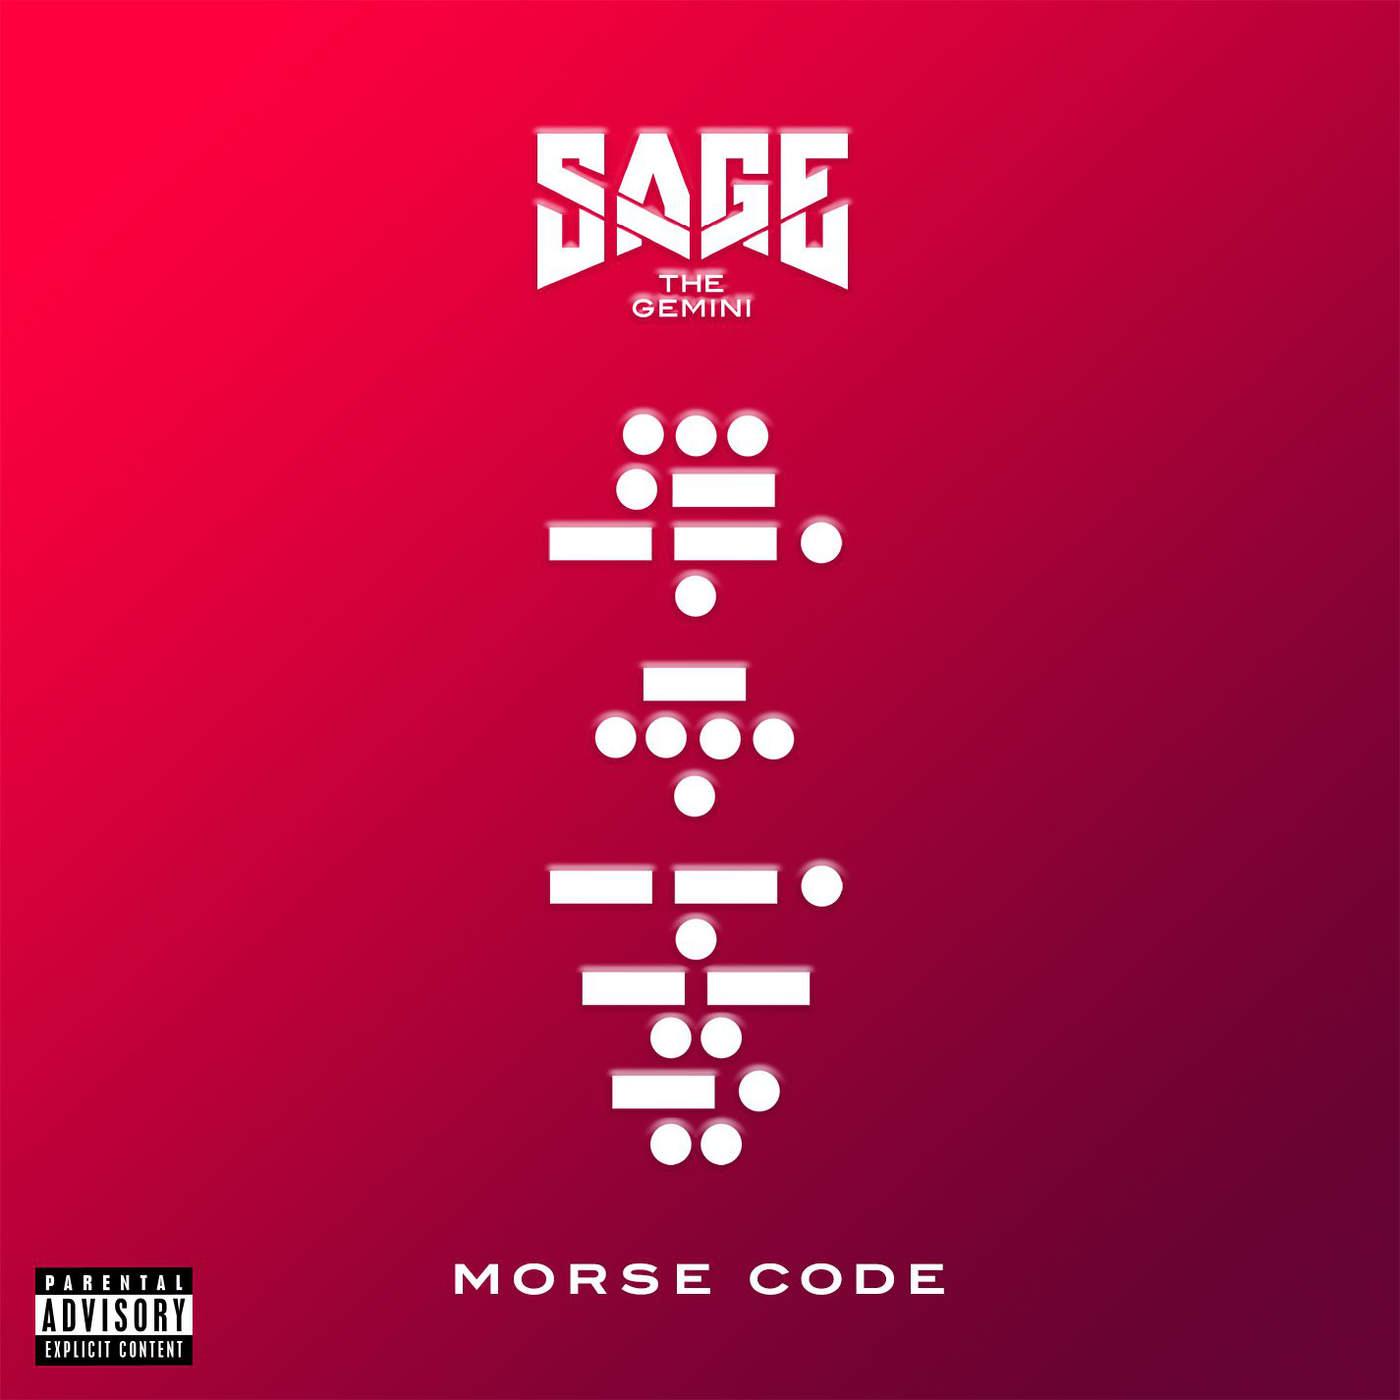 Sage The Gemini - Morse Code Cover